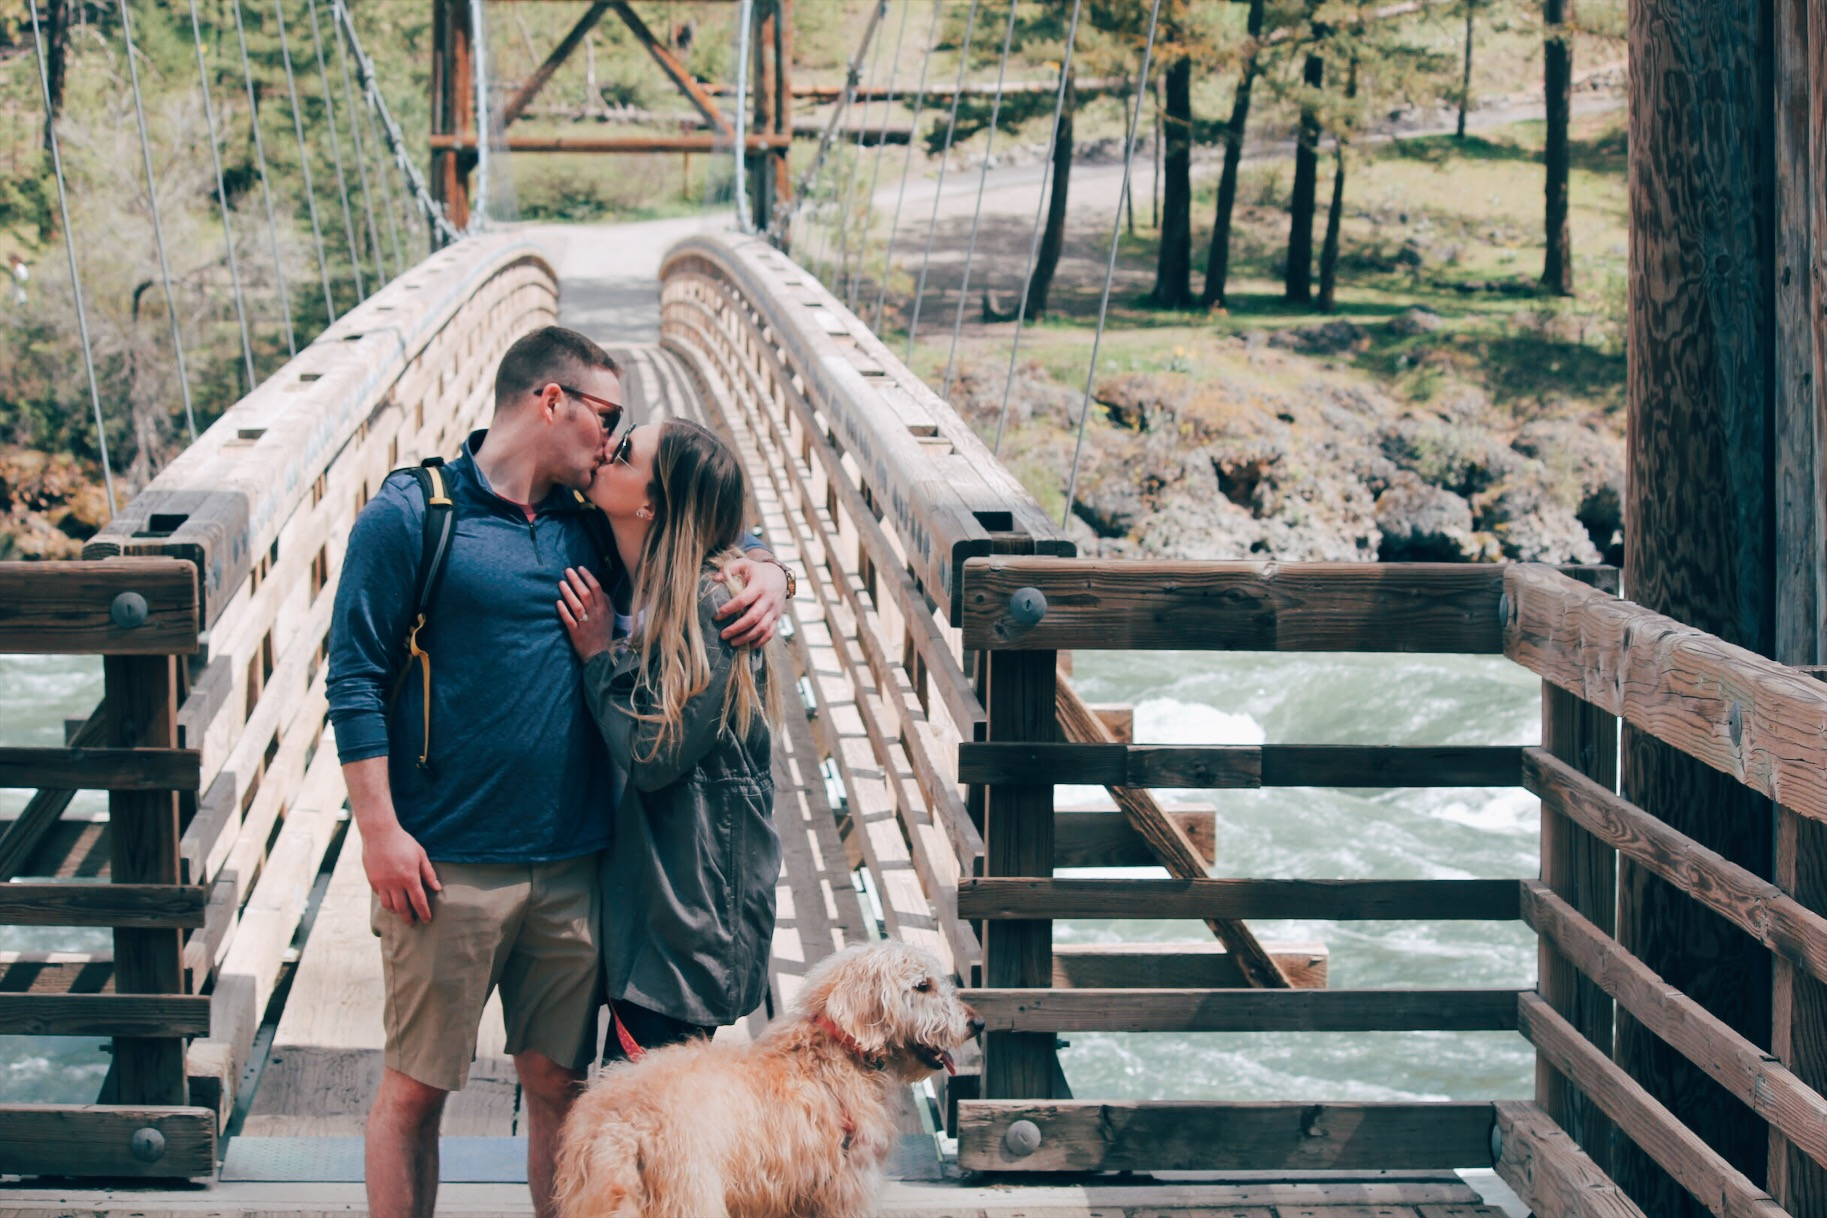 Engagement photo kissing Spokane bide